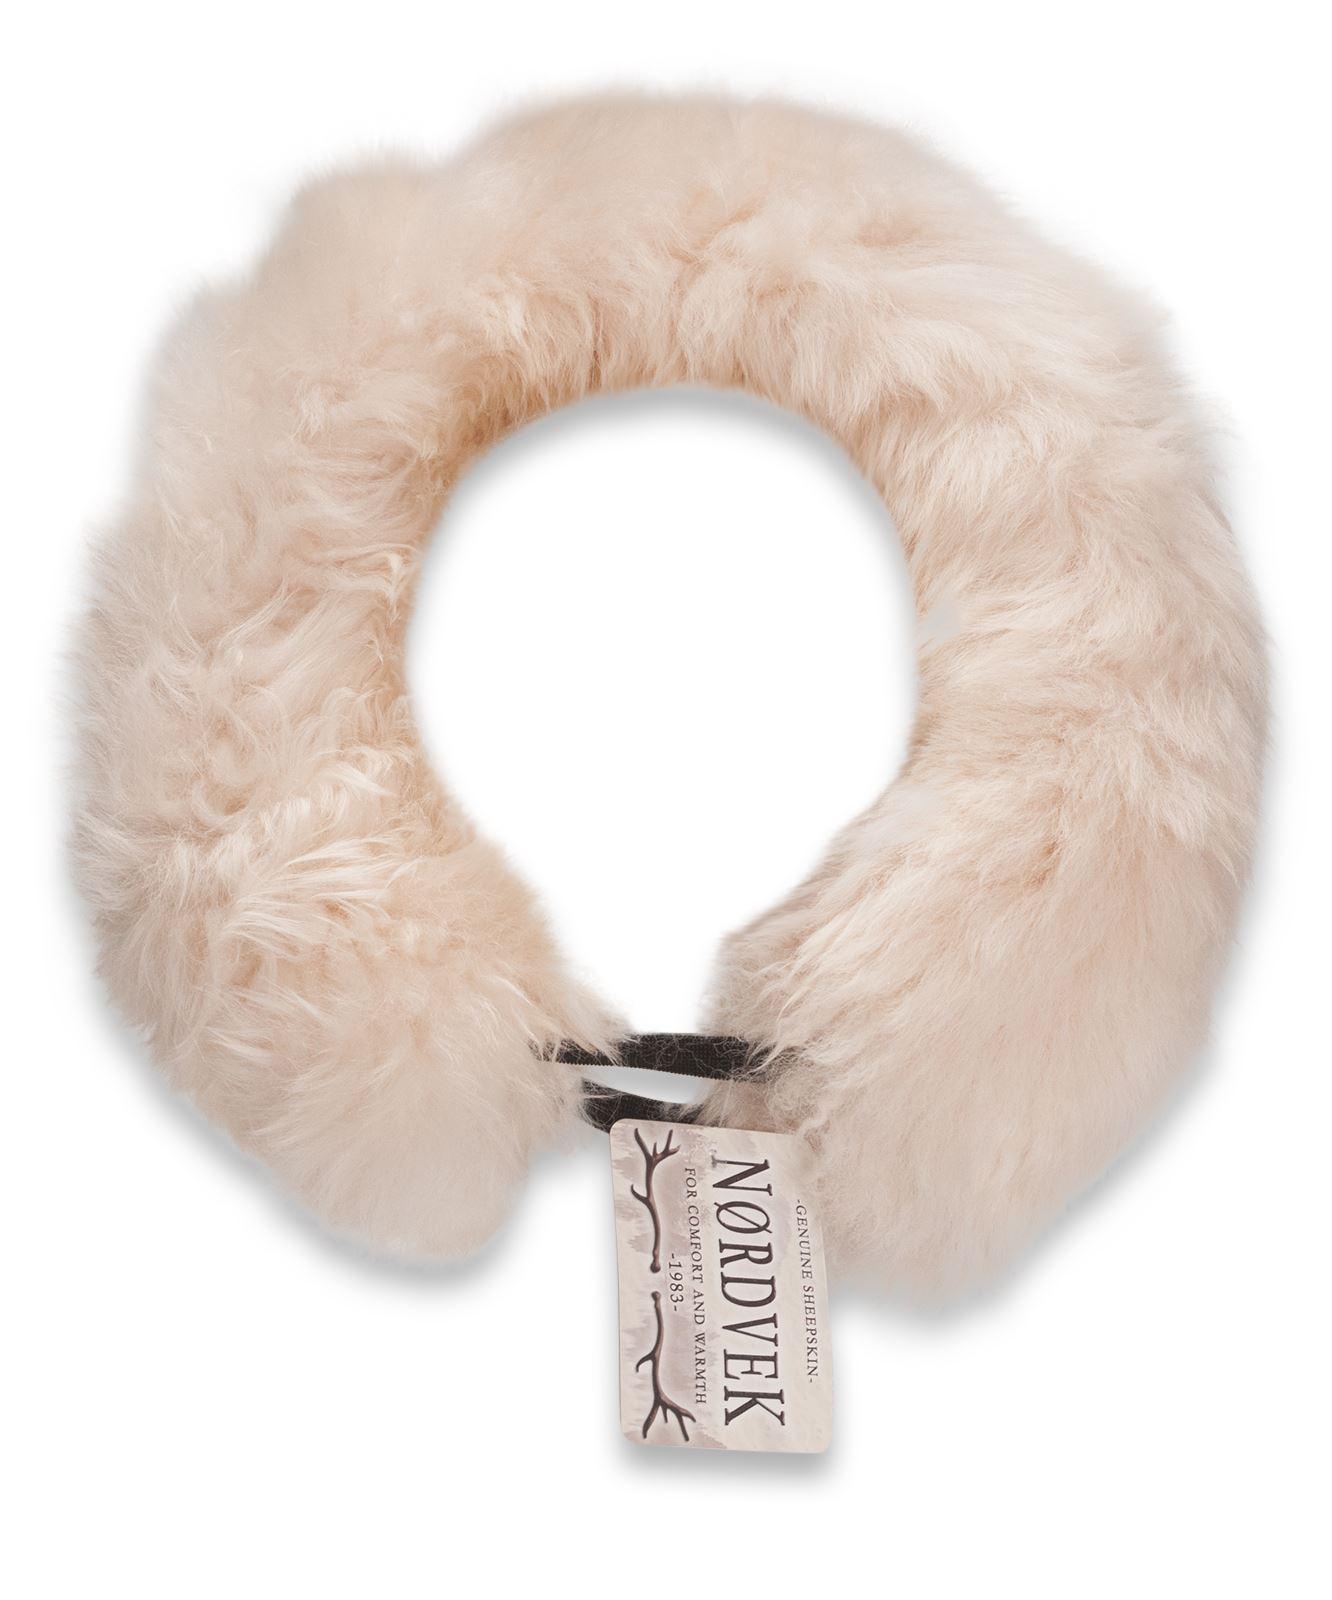 nordvek peau de mouton v ritable lastique bandeau t te bande mesdames femmes ebay. Black Bedroom Furniture Sets. Home Design Ideas